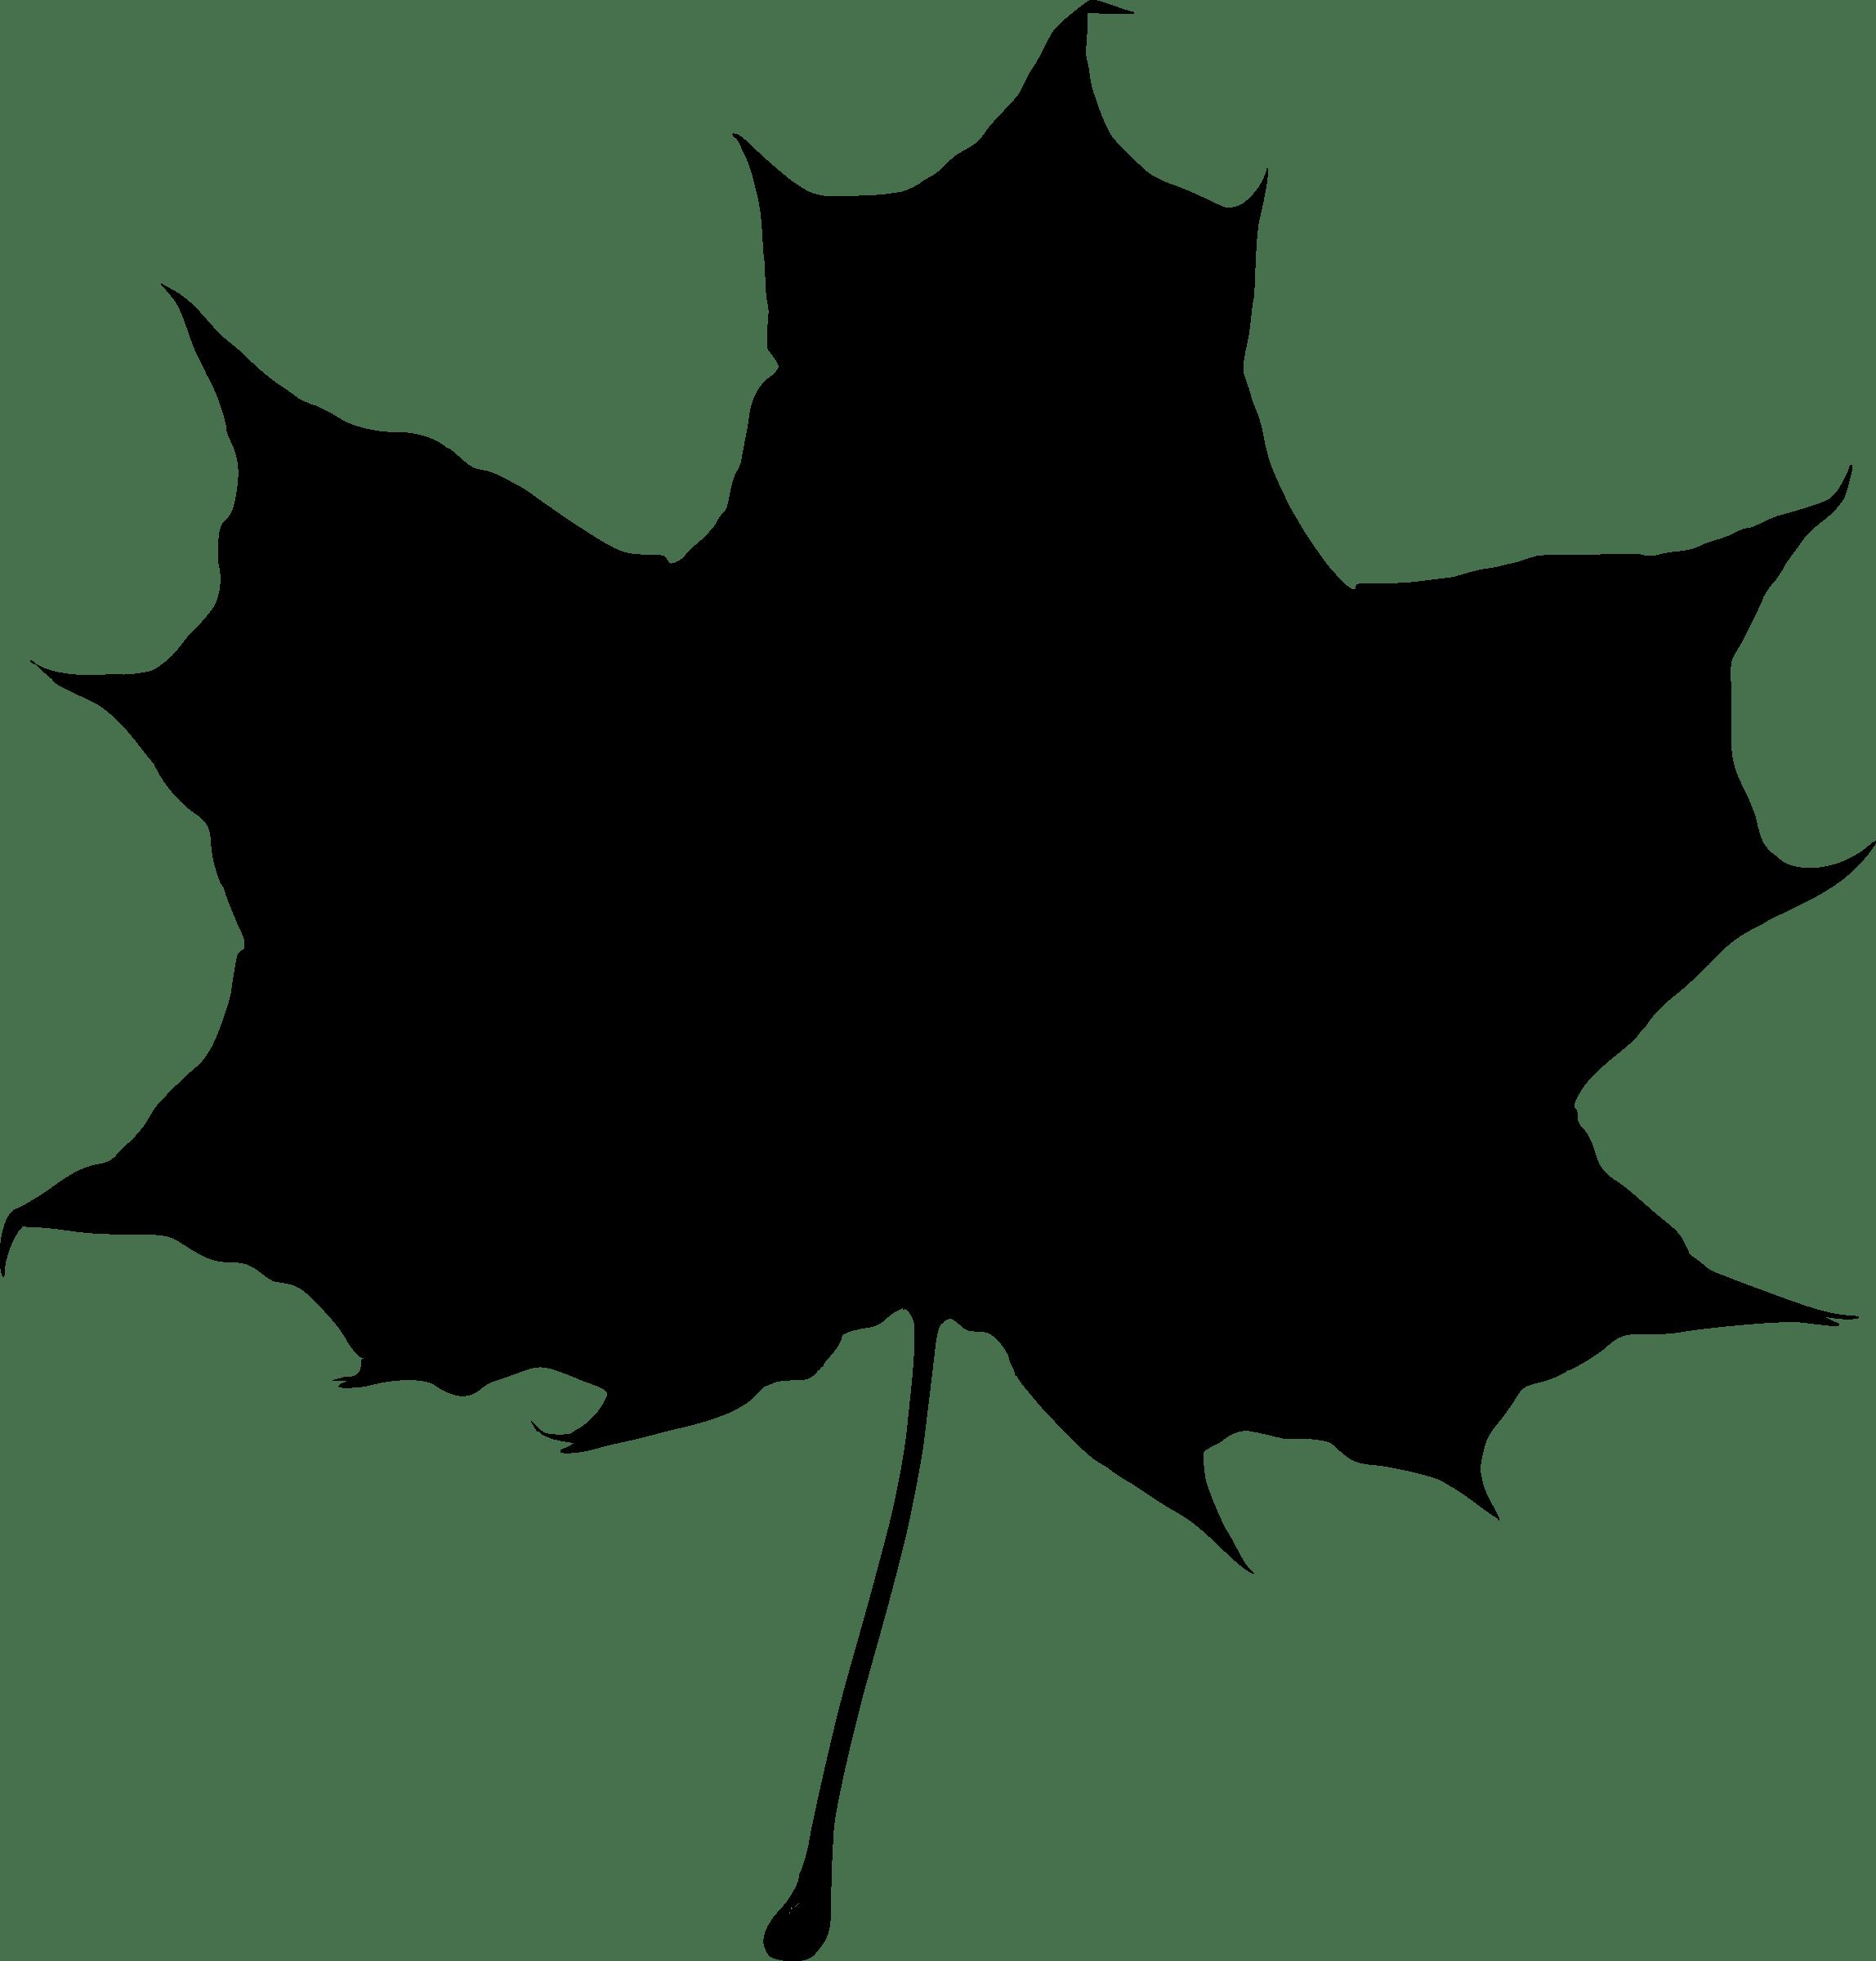 2296x2400 Maple Leaf Silhouette Transparent Png